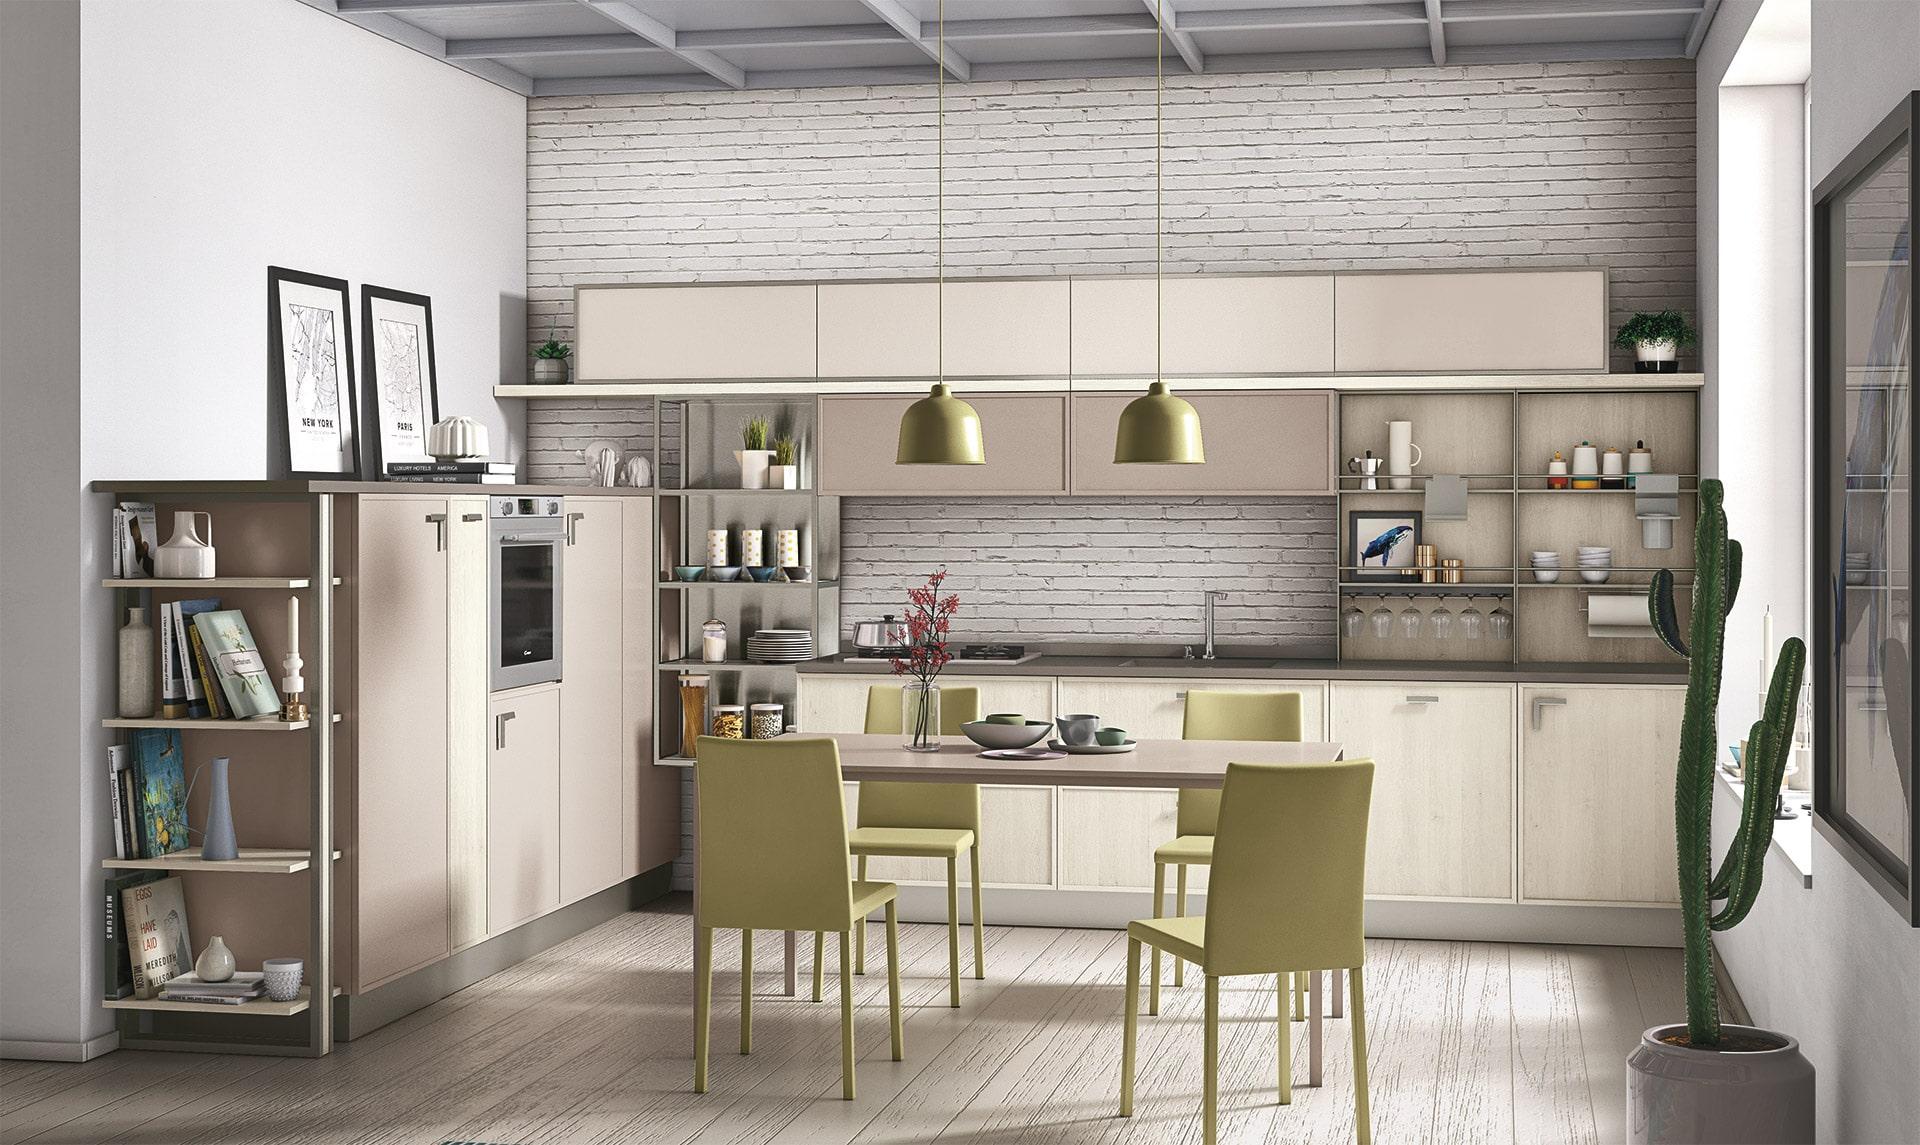 Cucina Rewind Lube Creo Store Pavia